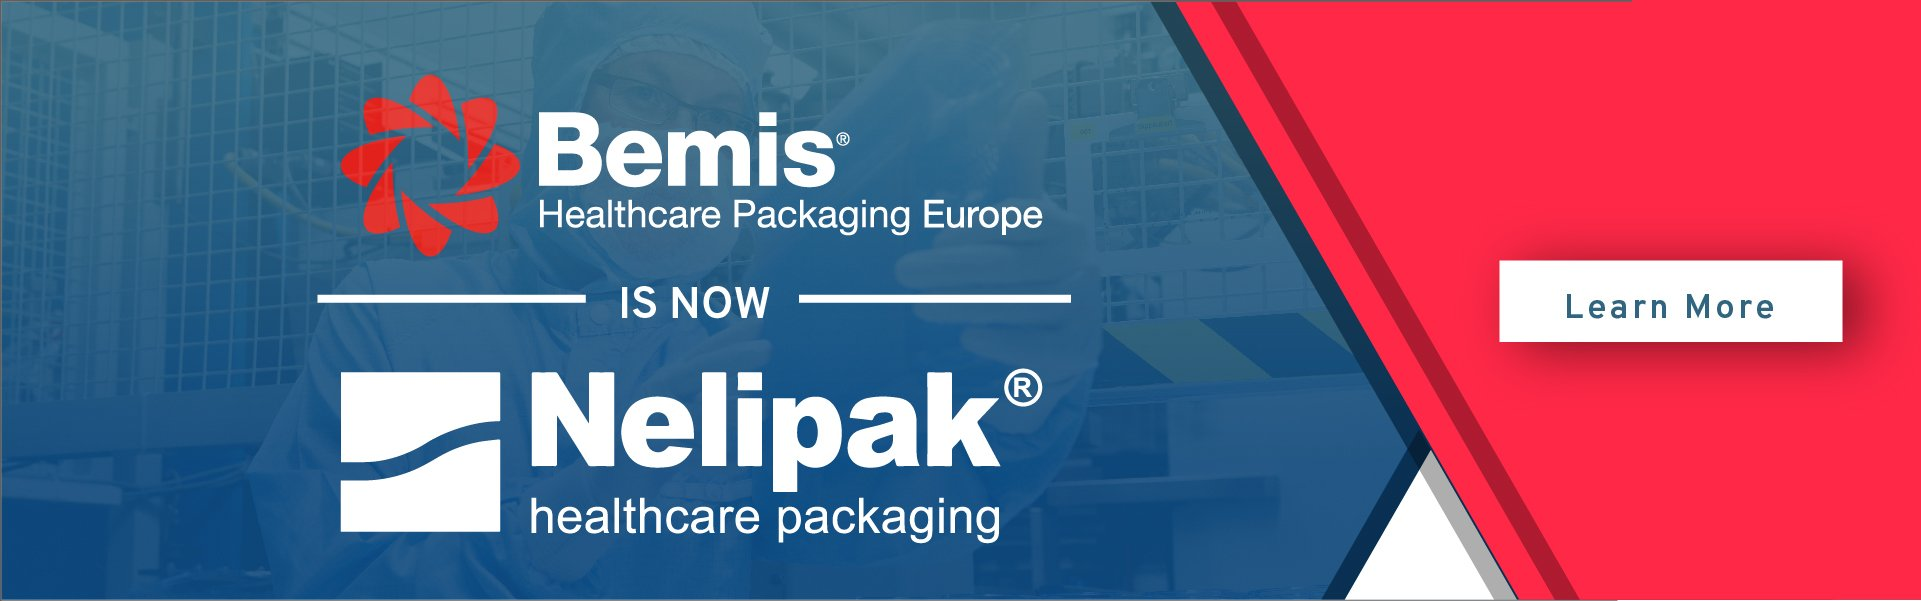 BHP Europe are now becoming Nelipak